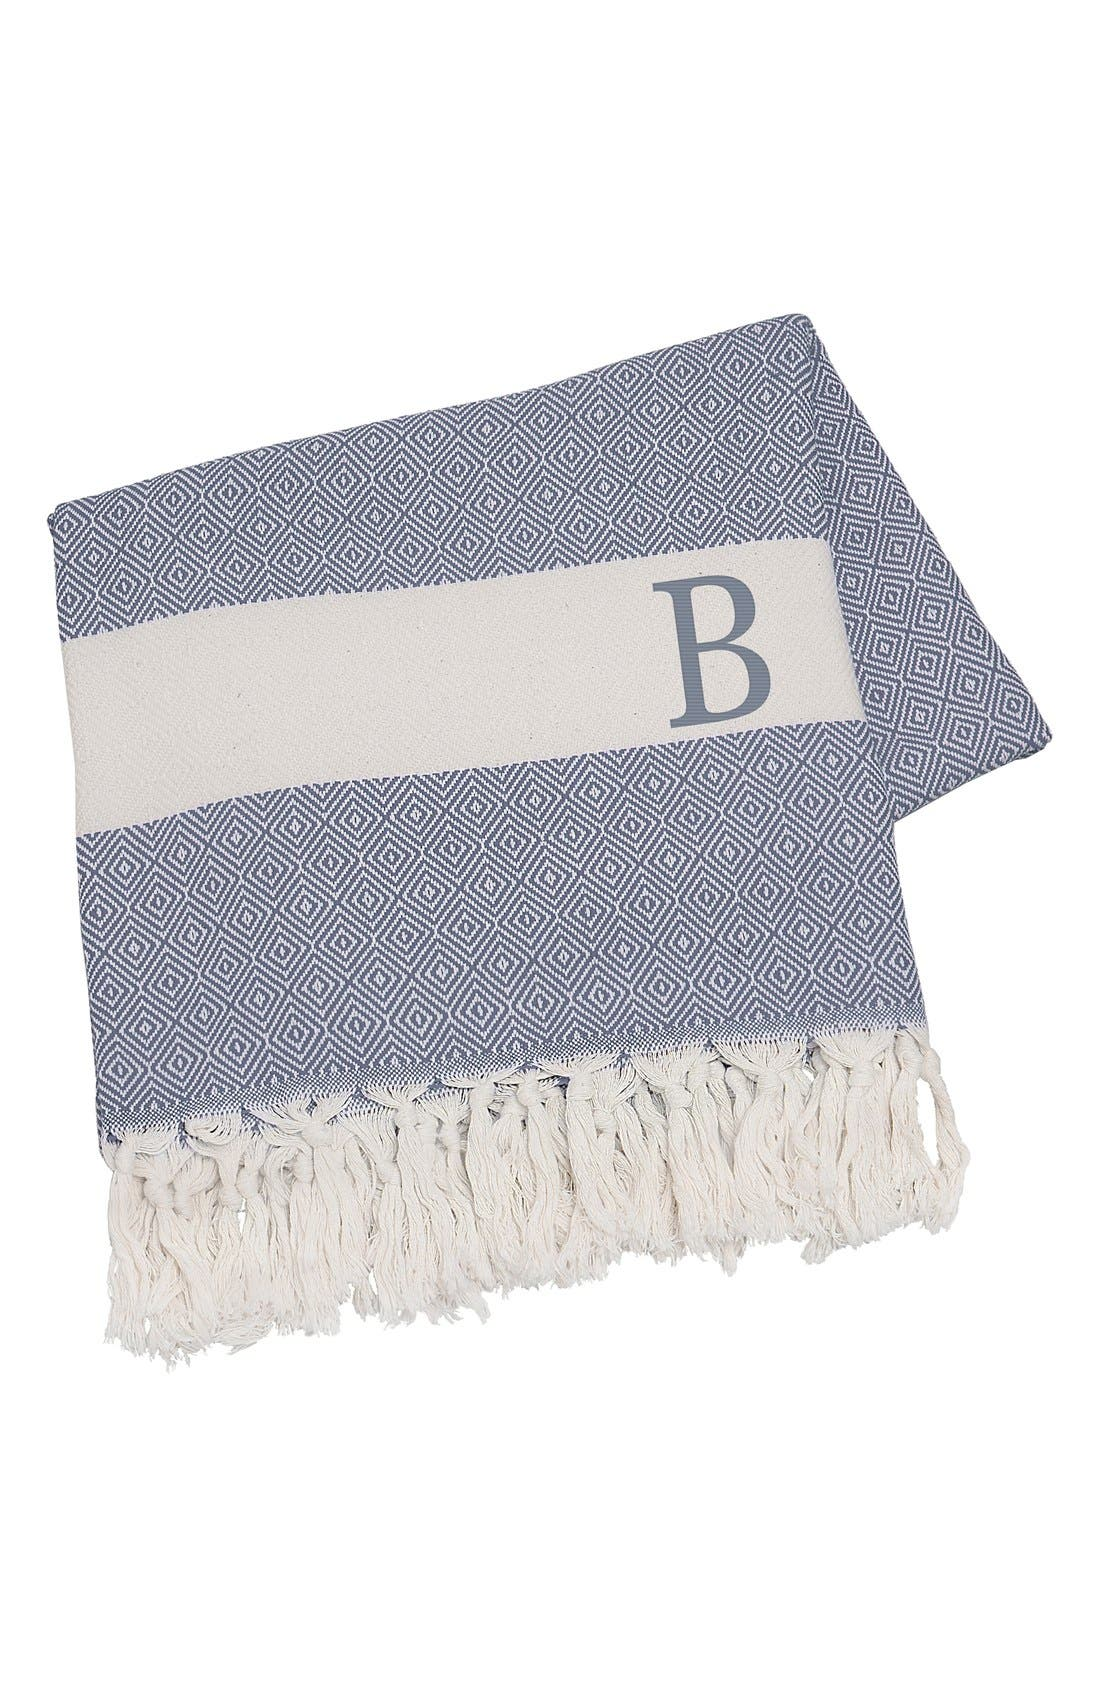 Monogram Turkish Cotton Throw,                             Main thumbnail 1, color,                             Blue - B